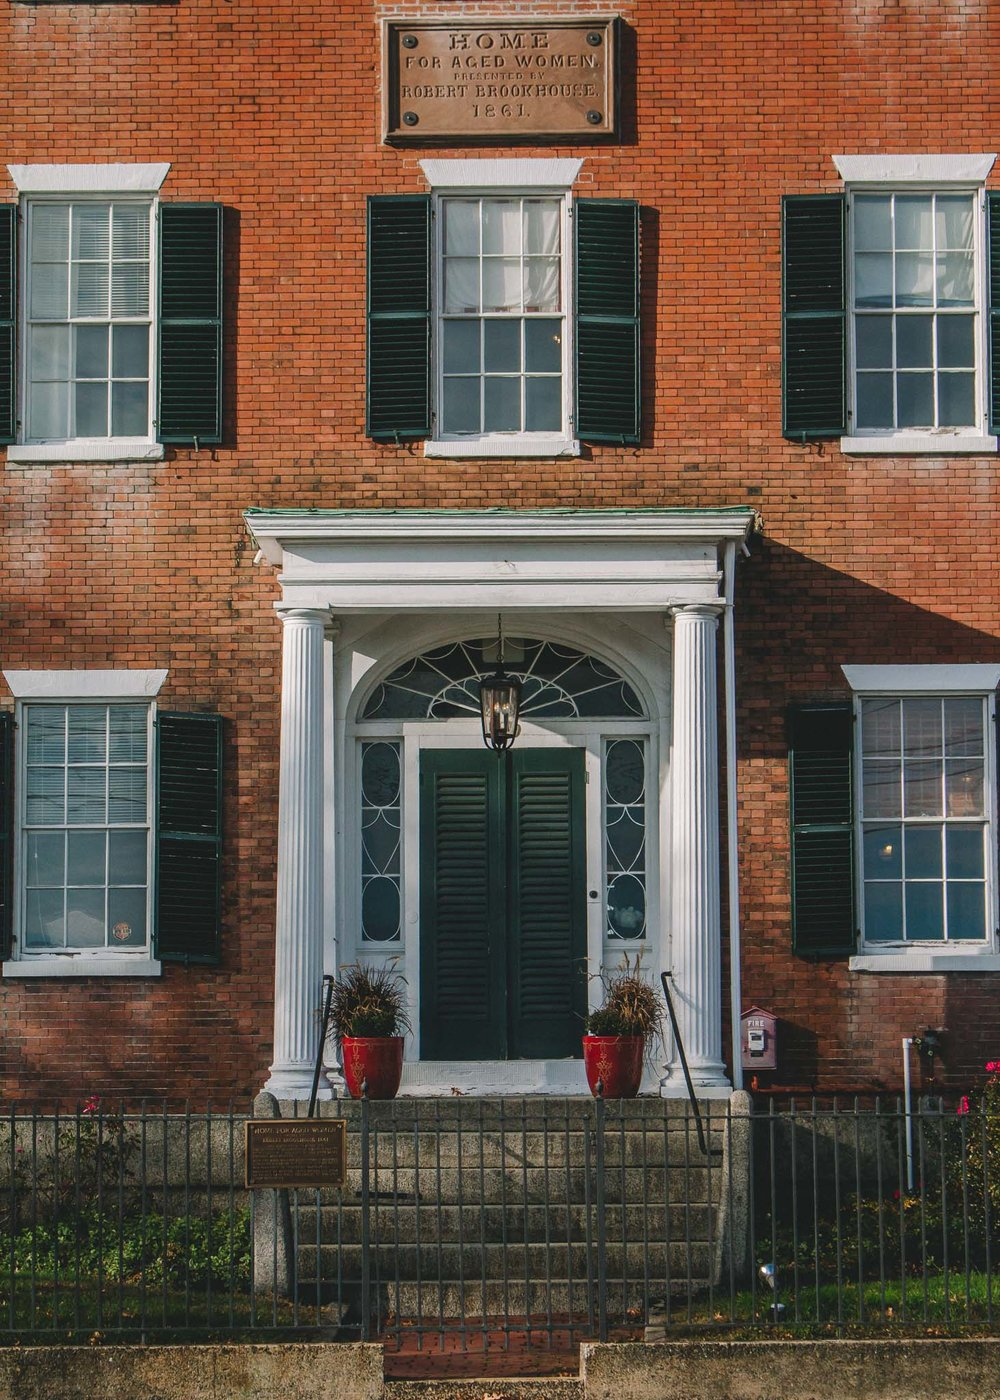 Brookhouse Door, Salem, MA